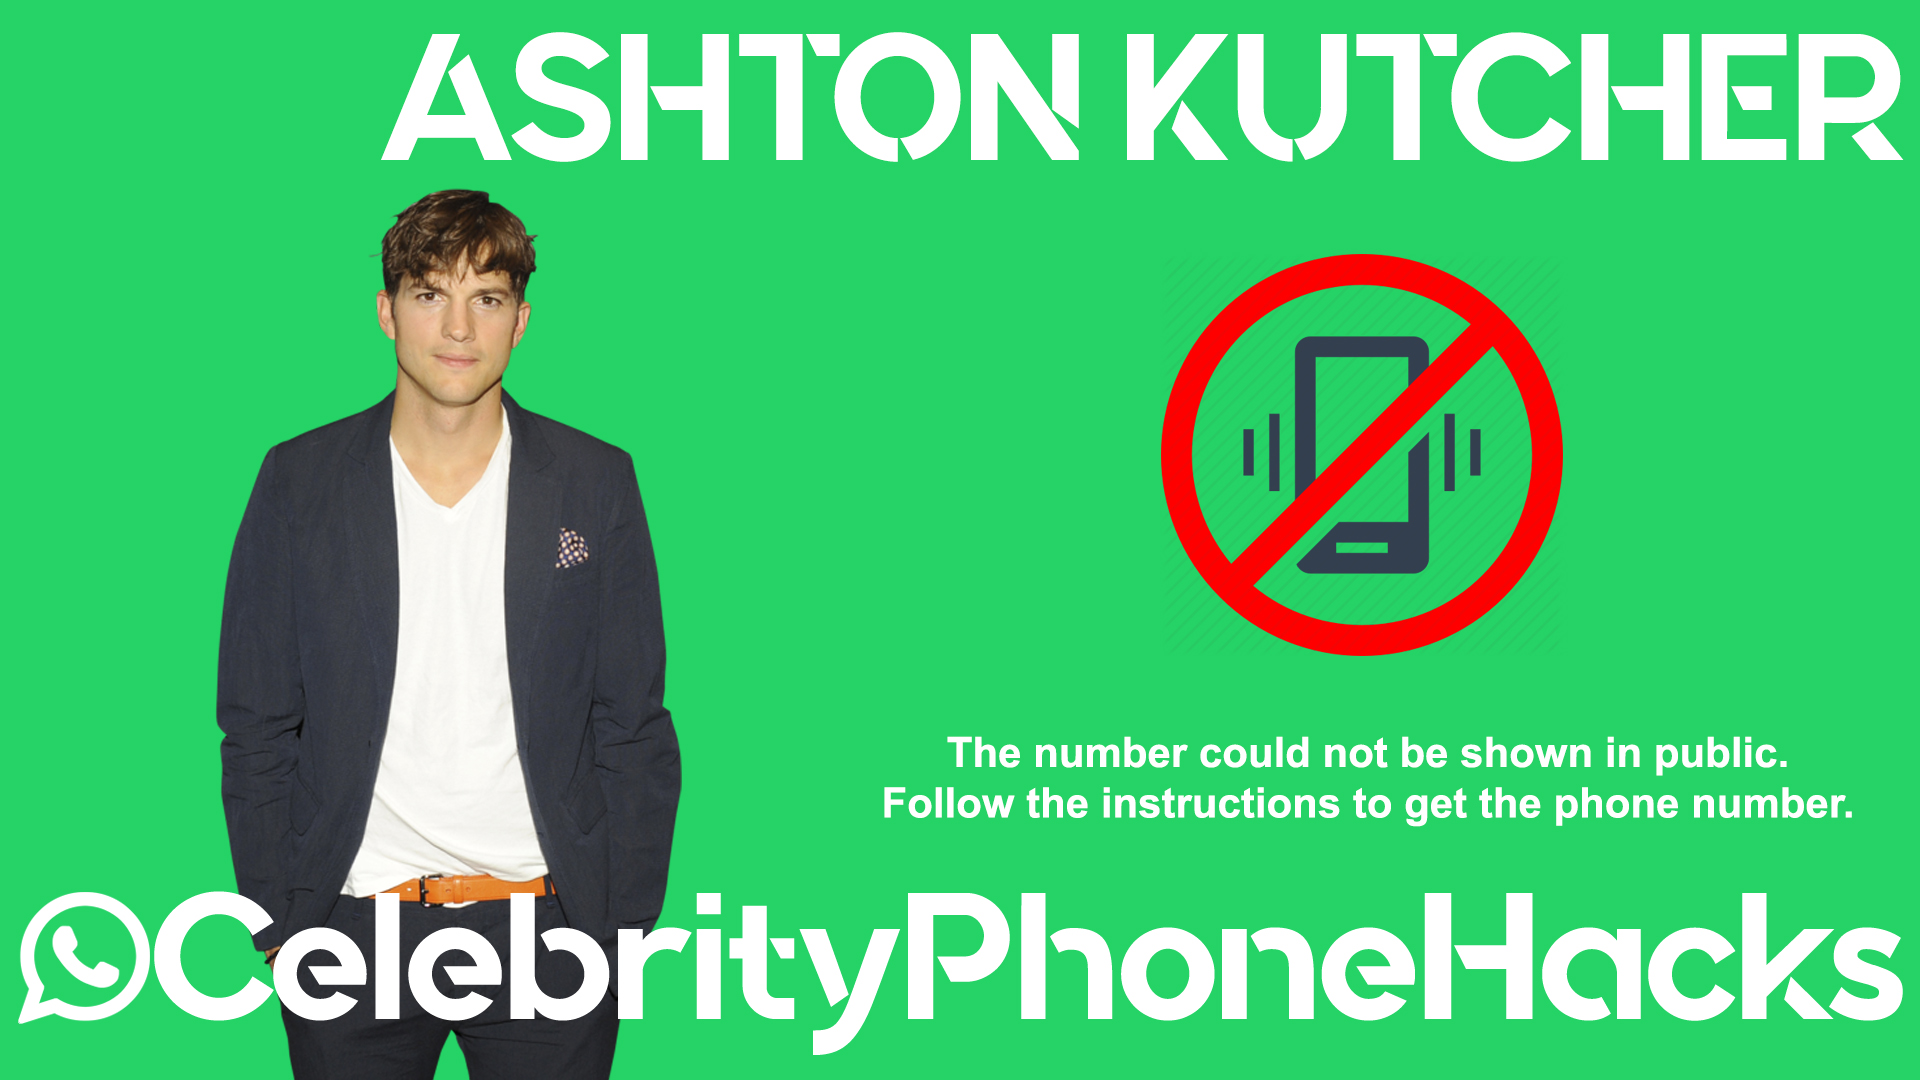 Ashton Kutcher real phone number 2019 whatsapp hacked leaked